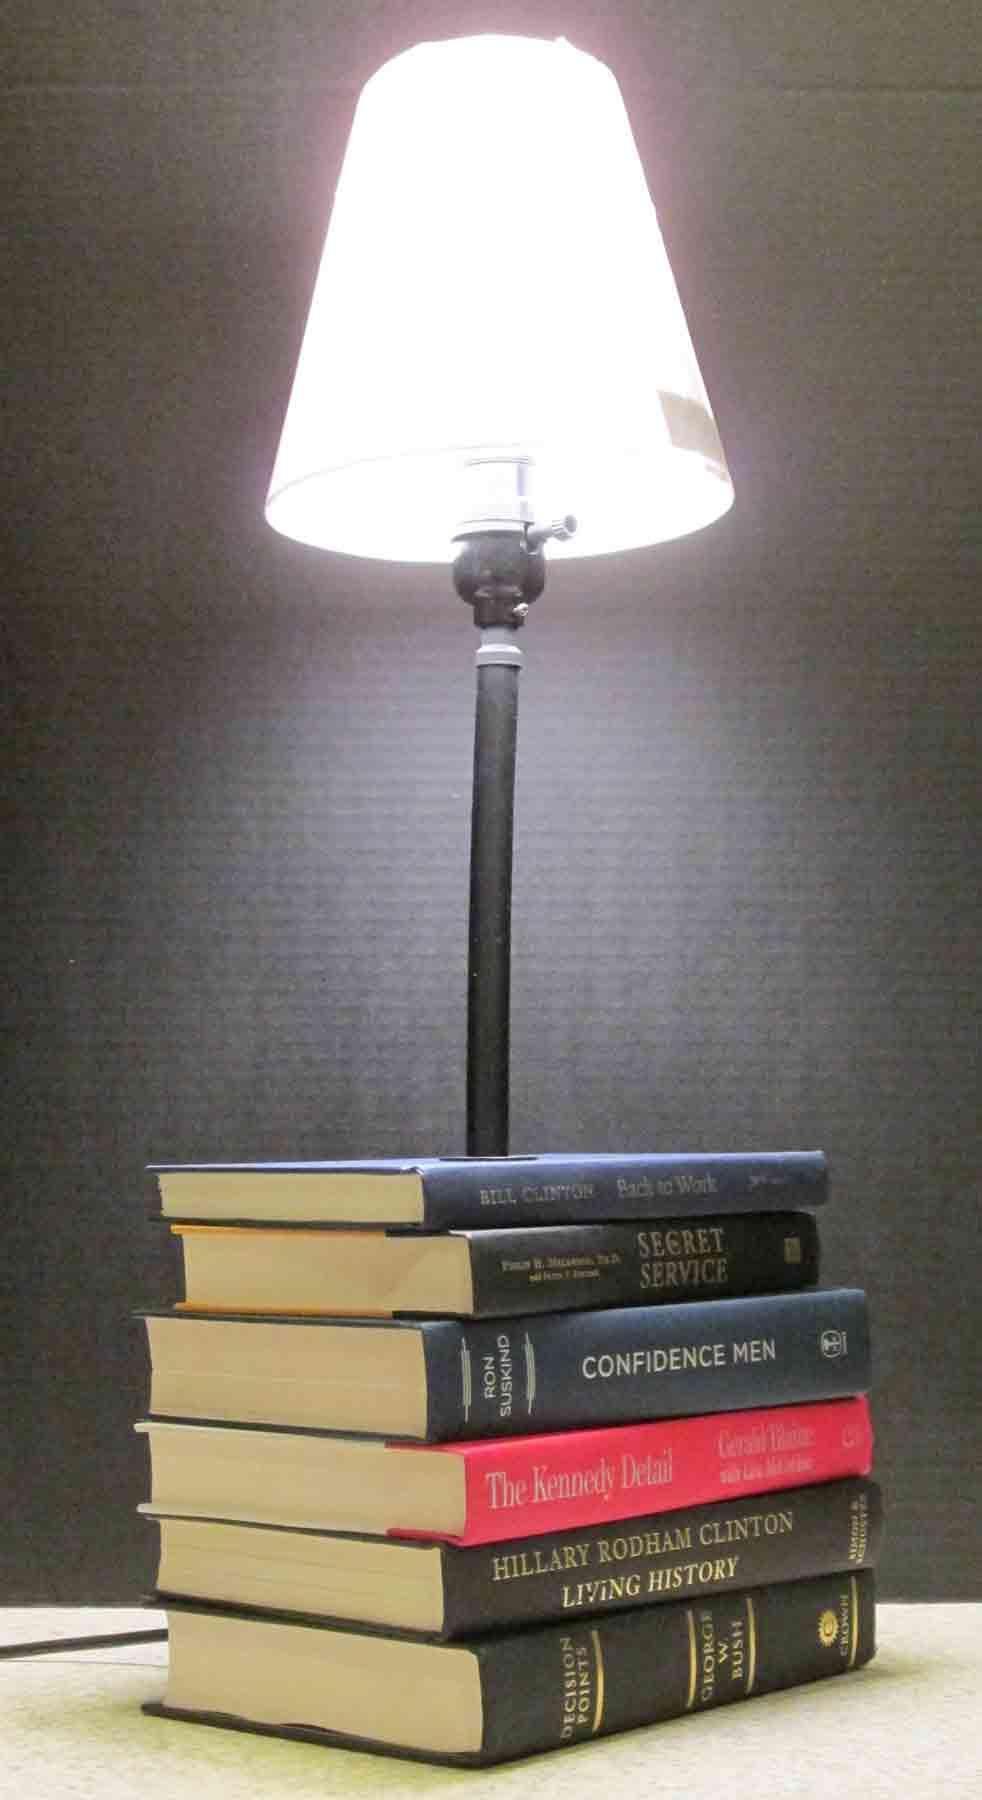 Custom table lamp lamp made of books book decor book lamp desk custom table lamp lamp made of books book decor book lamp desk lamp stack of books custom lamp book lover gift unique lamp aloadofball Choice Image